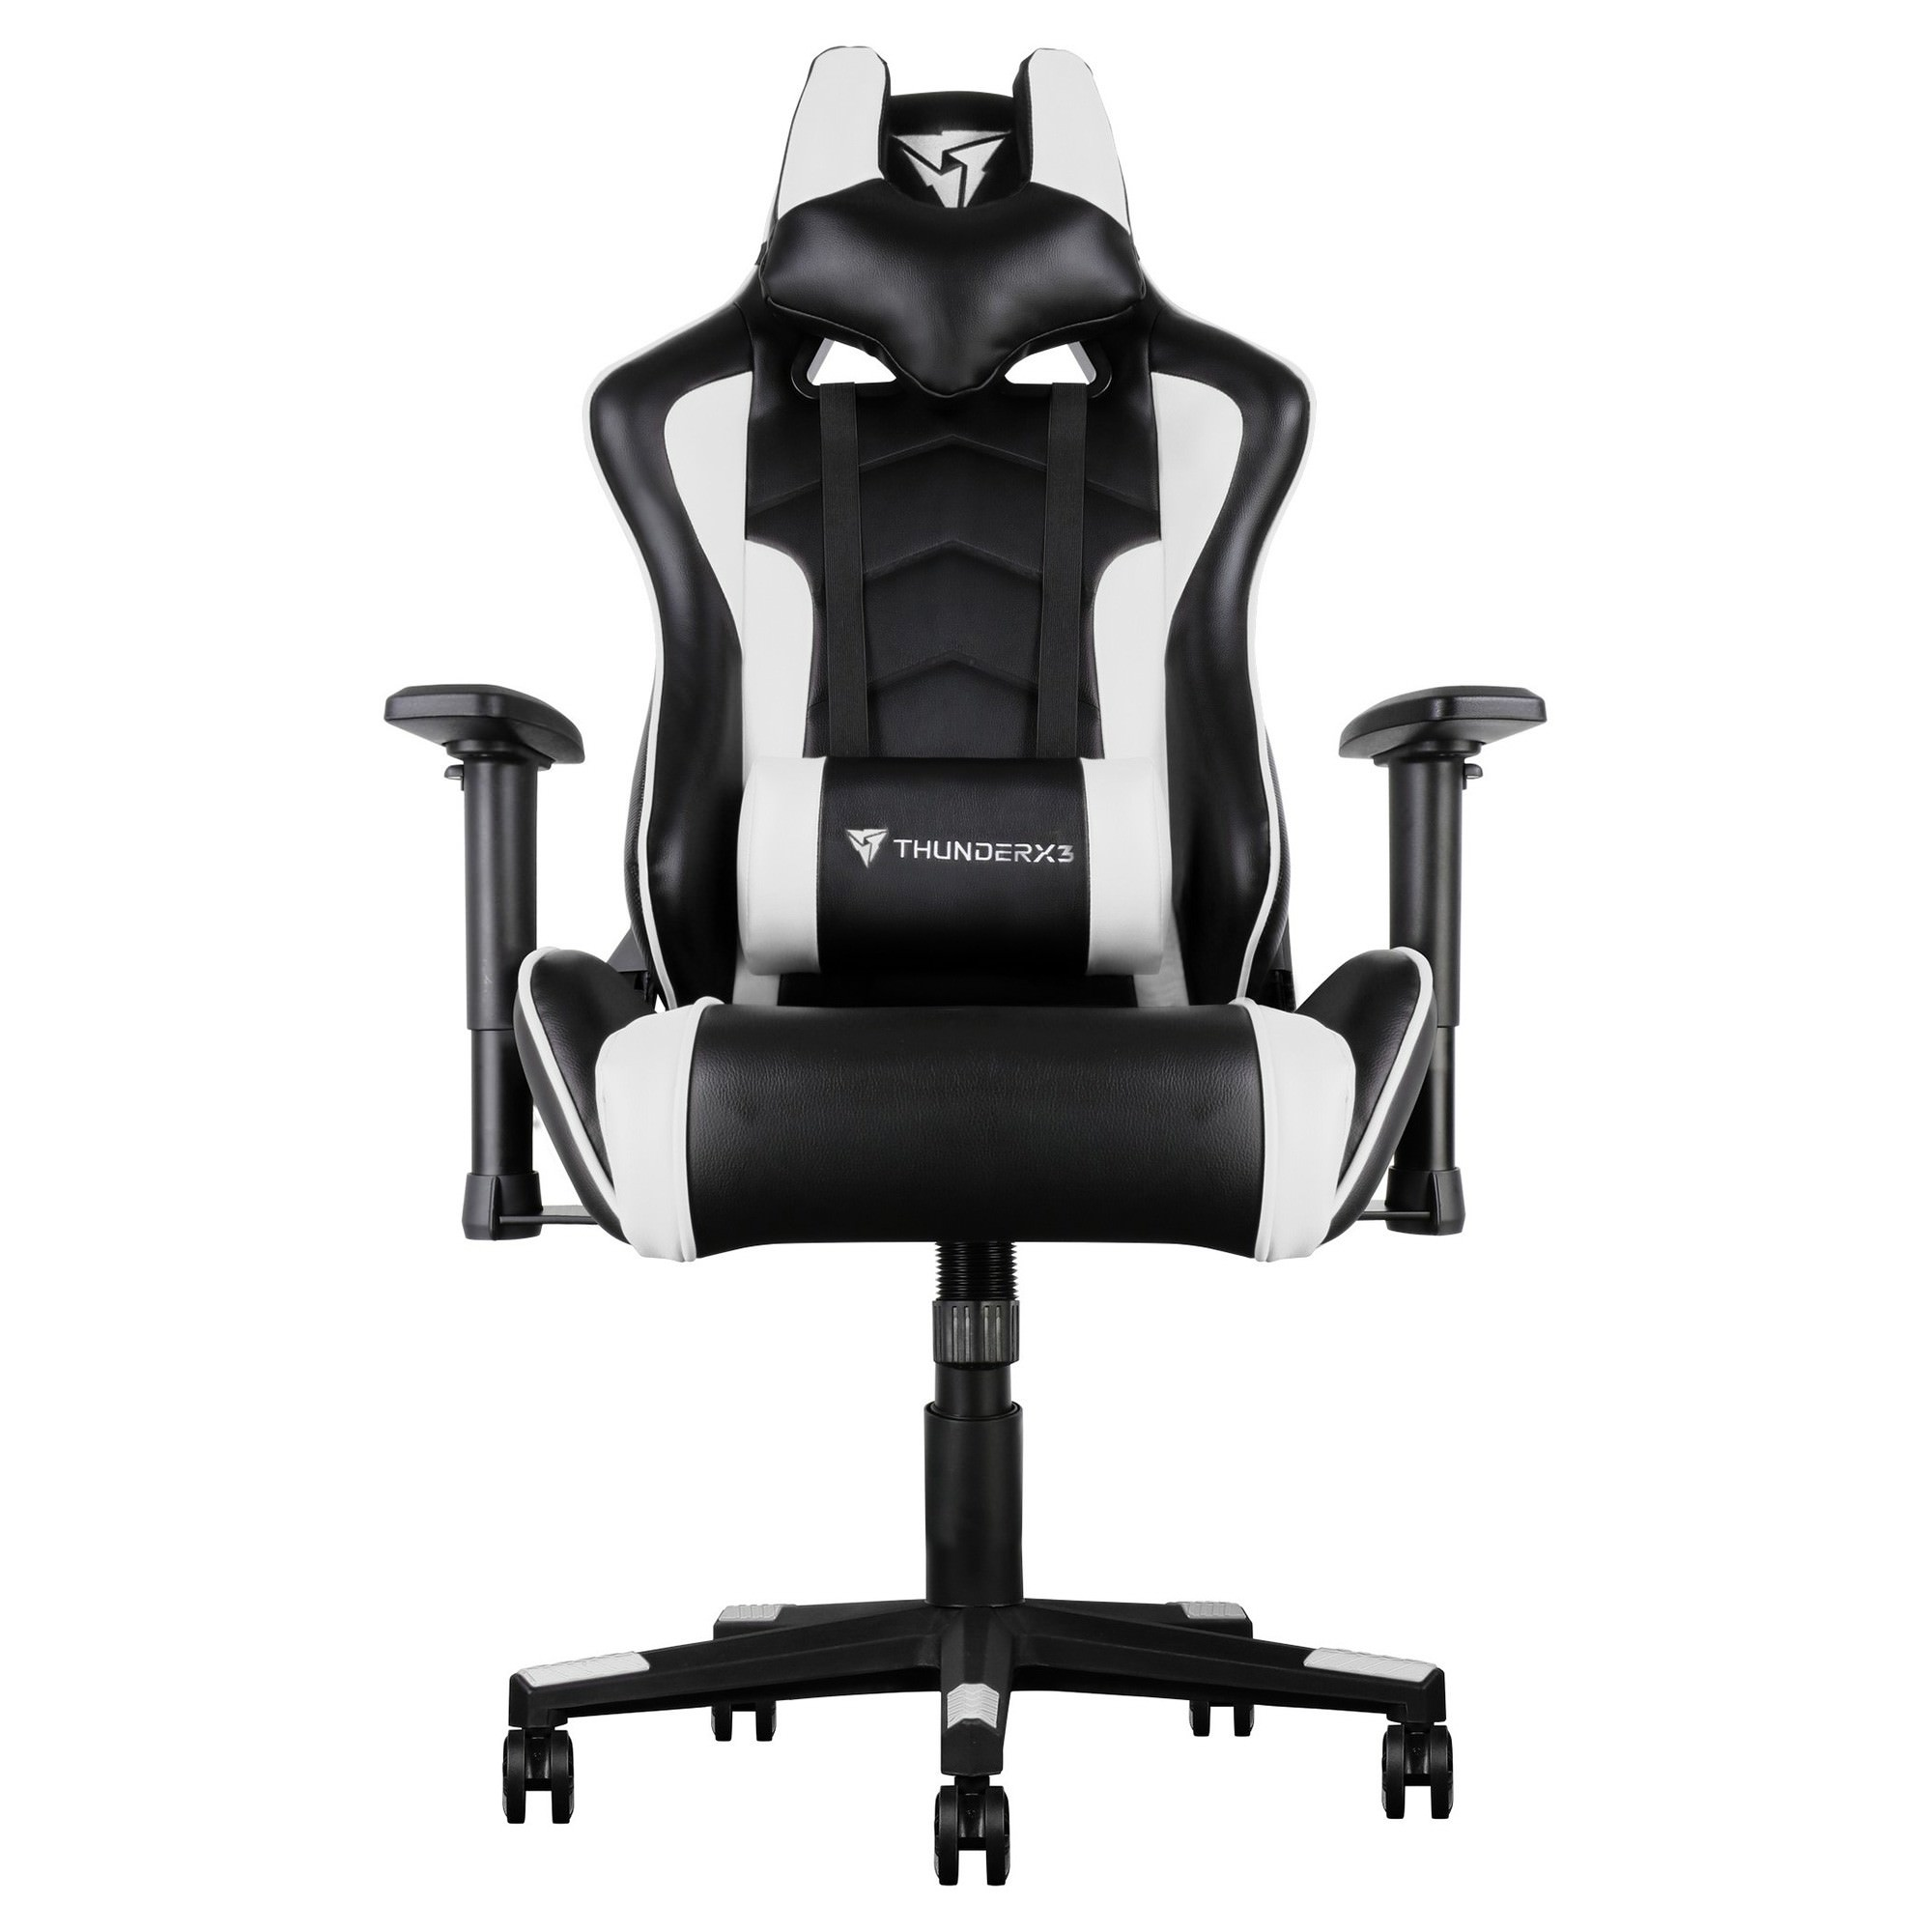 ThunderX3 TGC22 Gaming Chair, Black / White